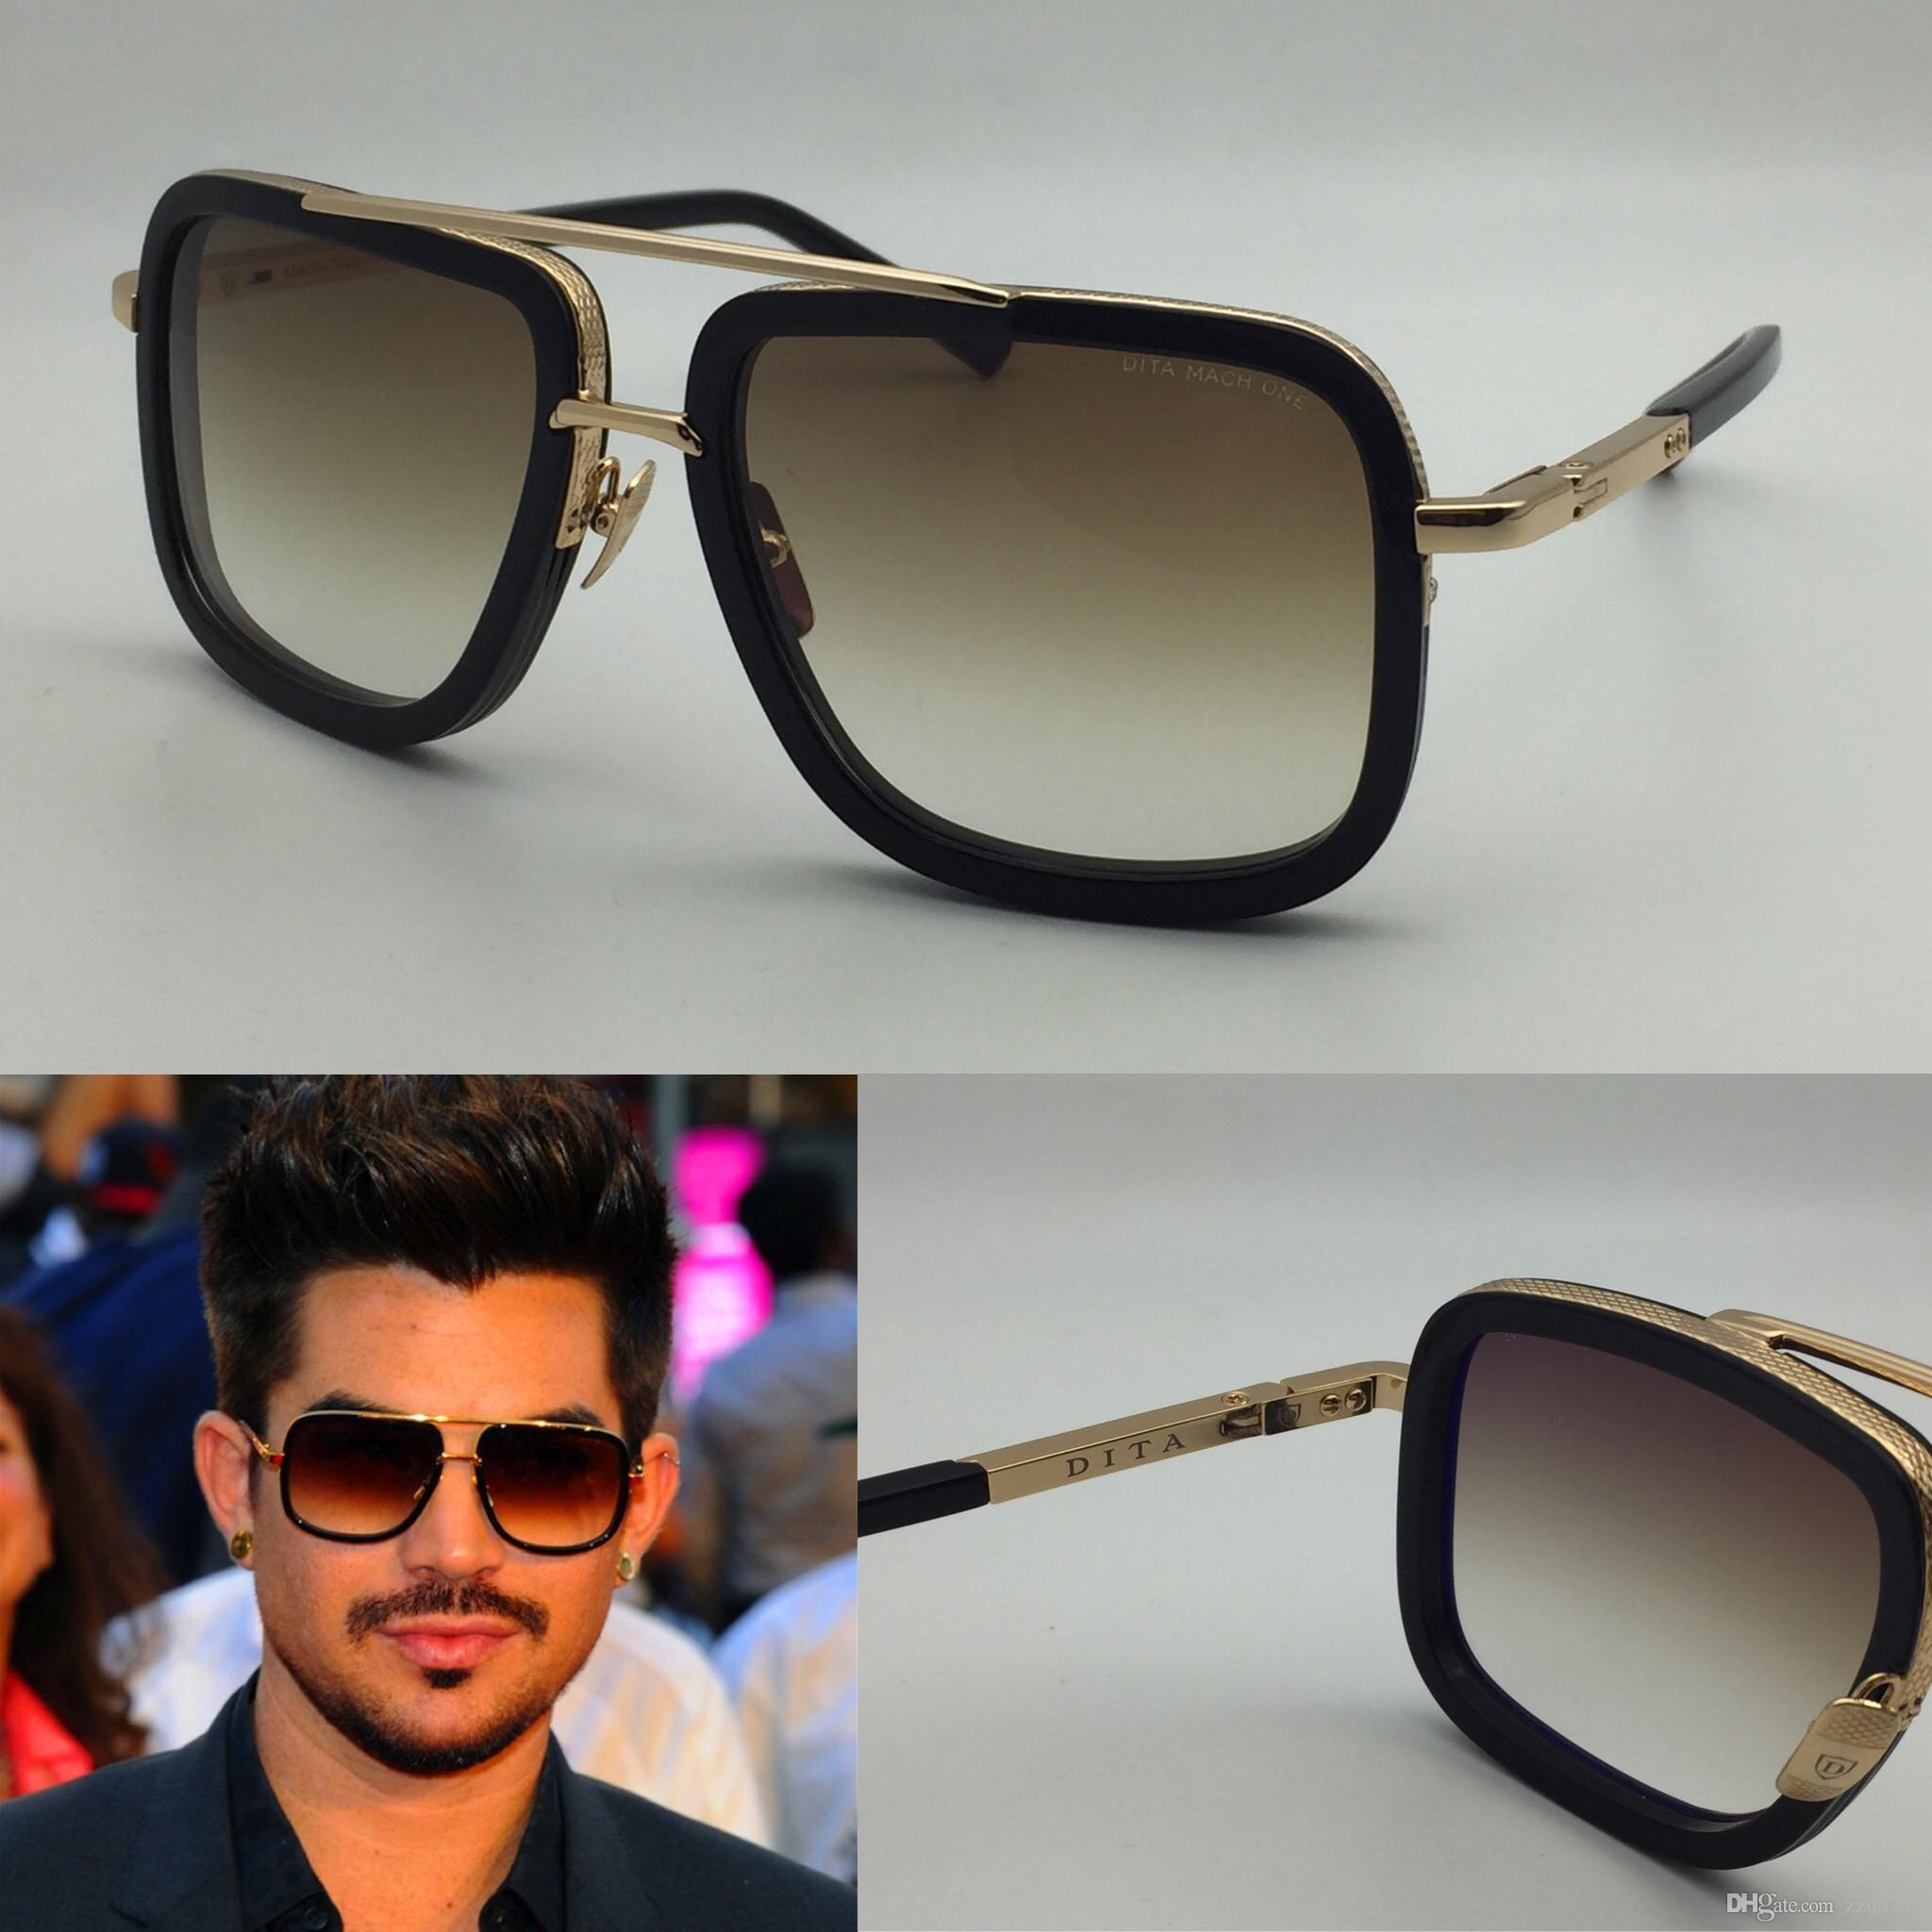 f603b3e538 Top 5 Sunglasses Brands For Men